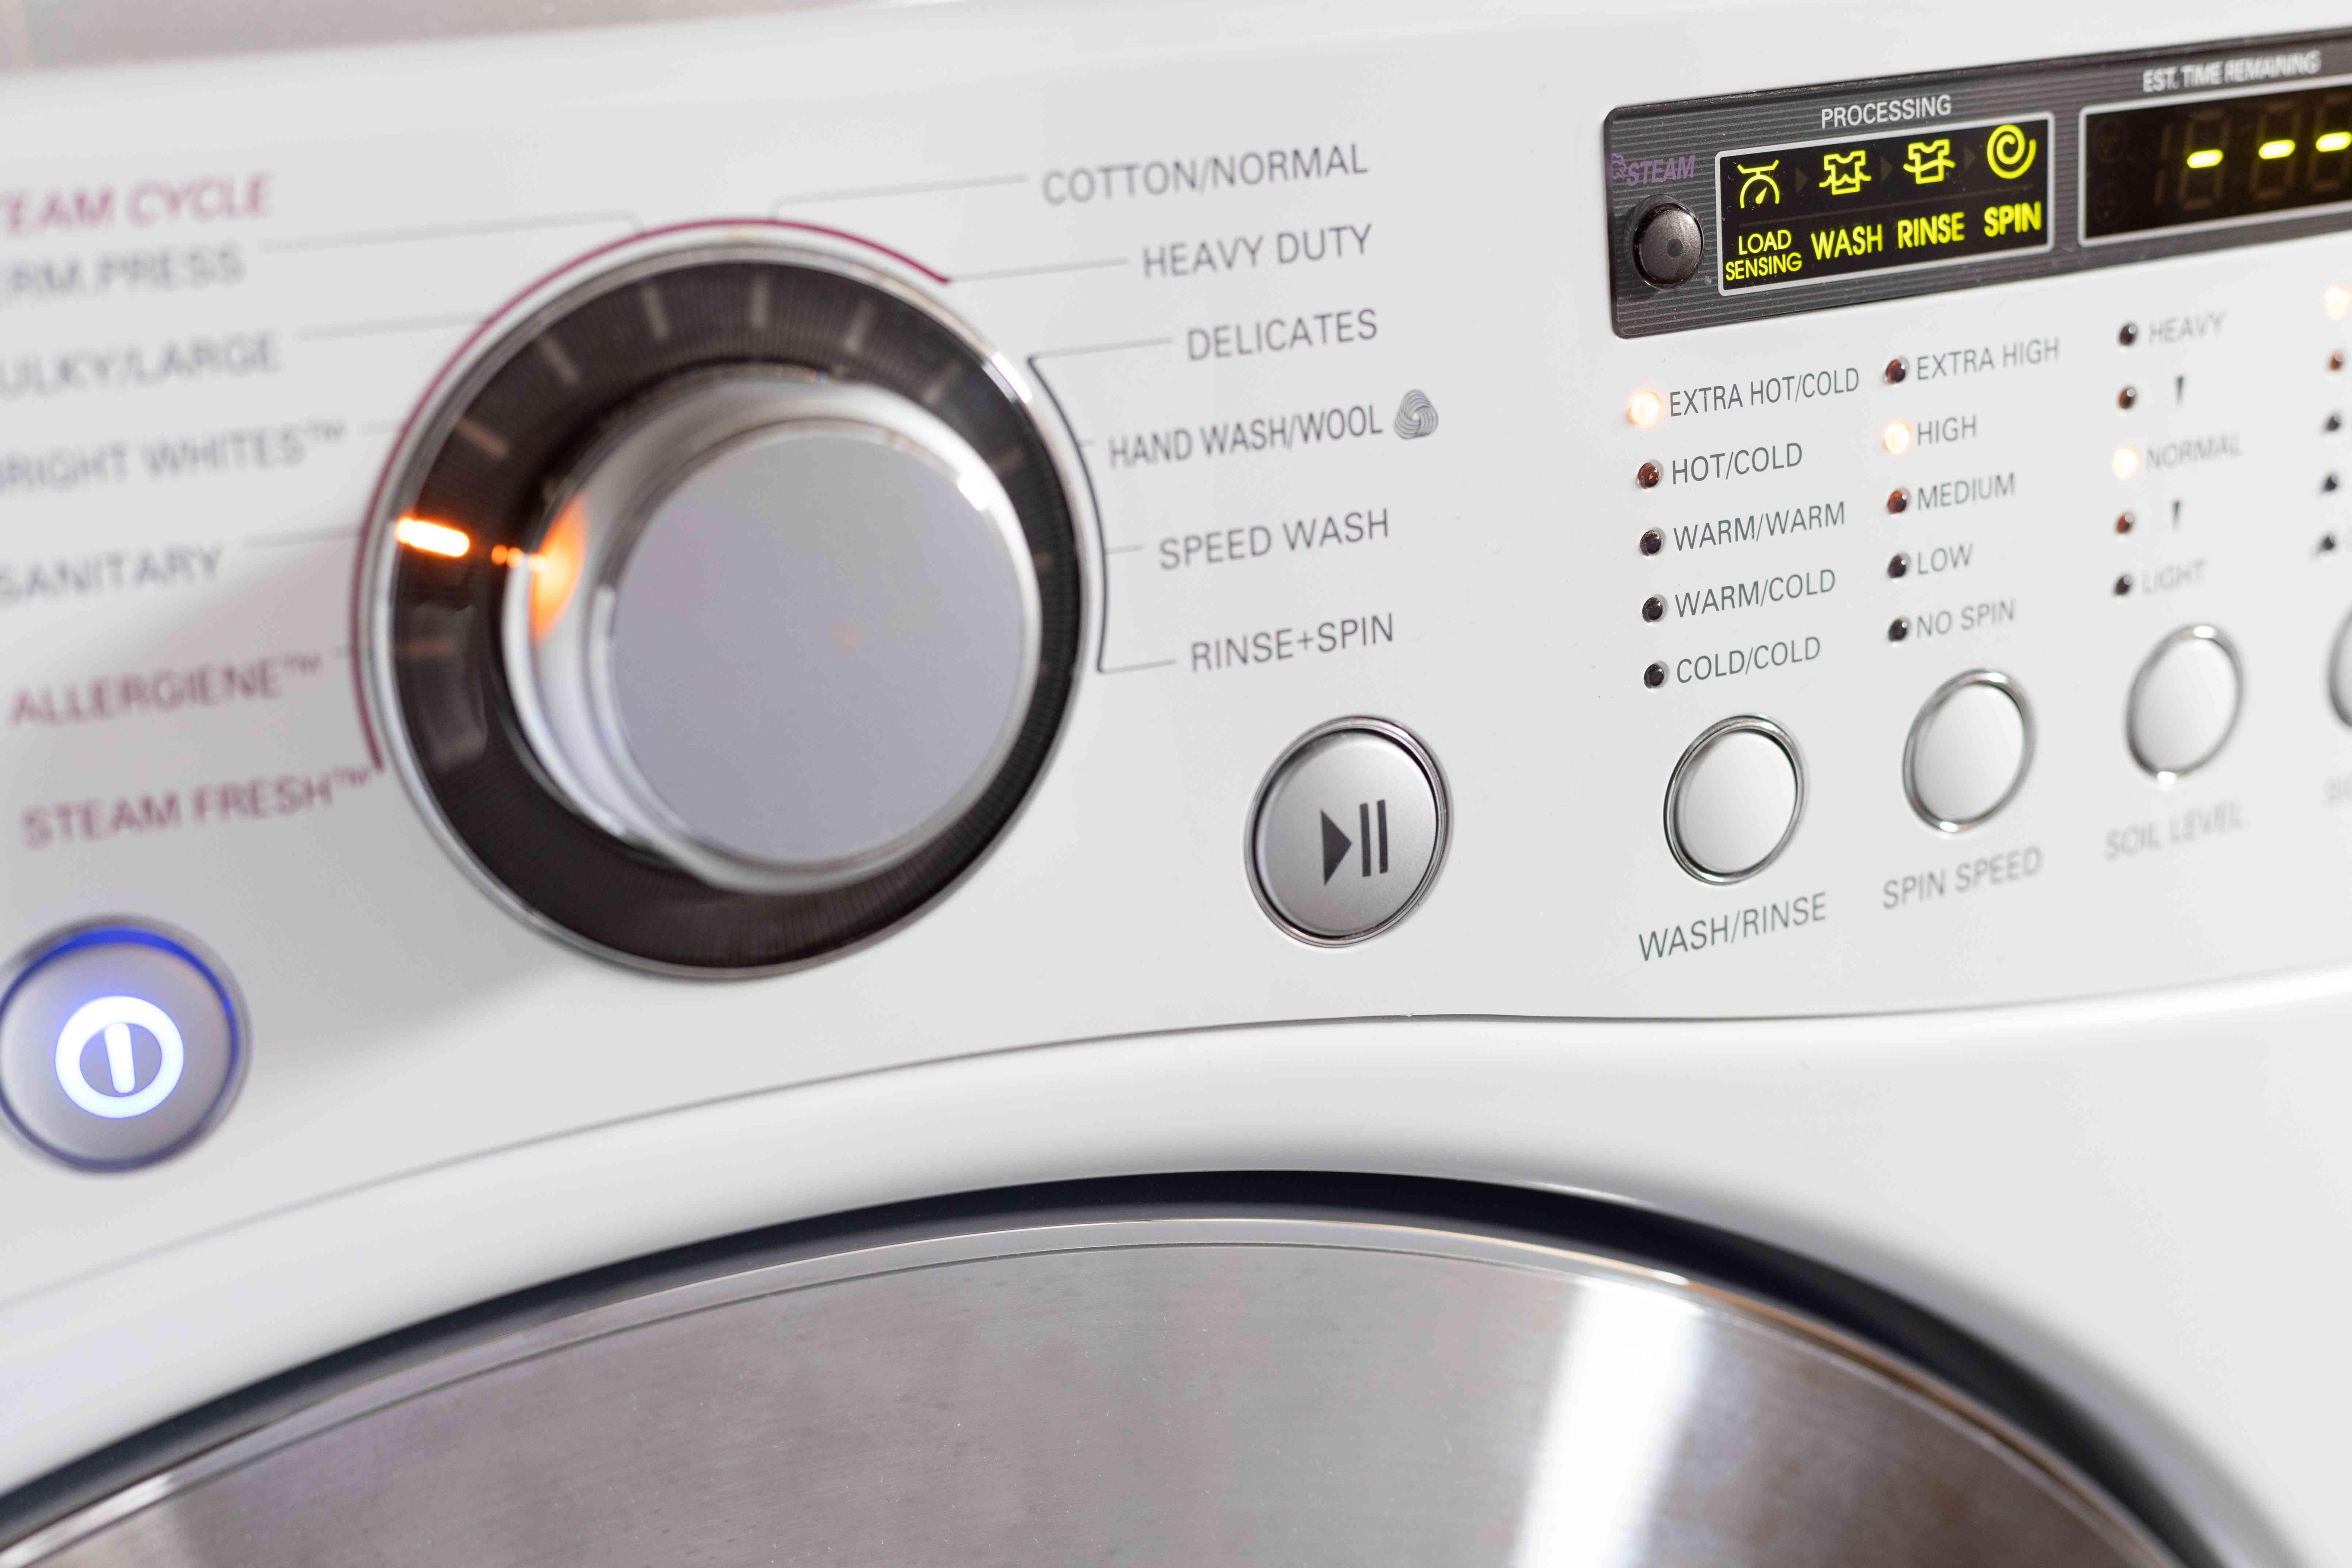 Washing machine with dial